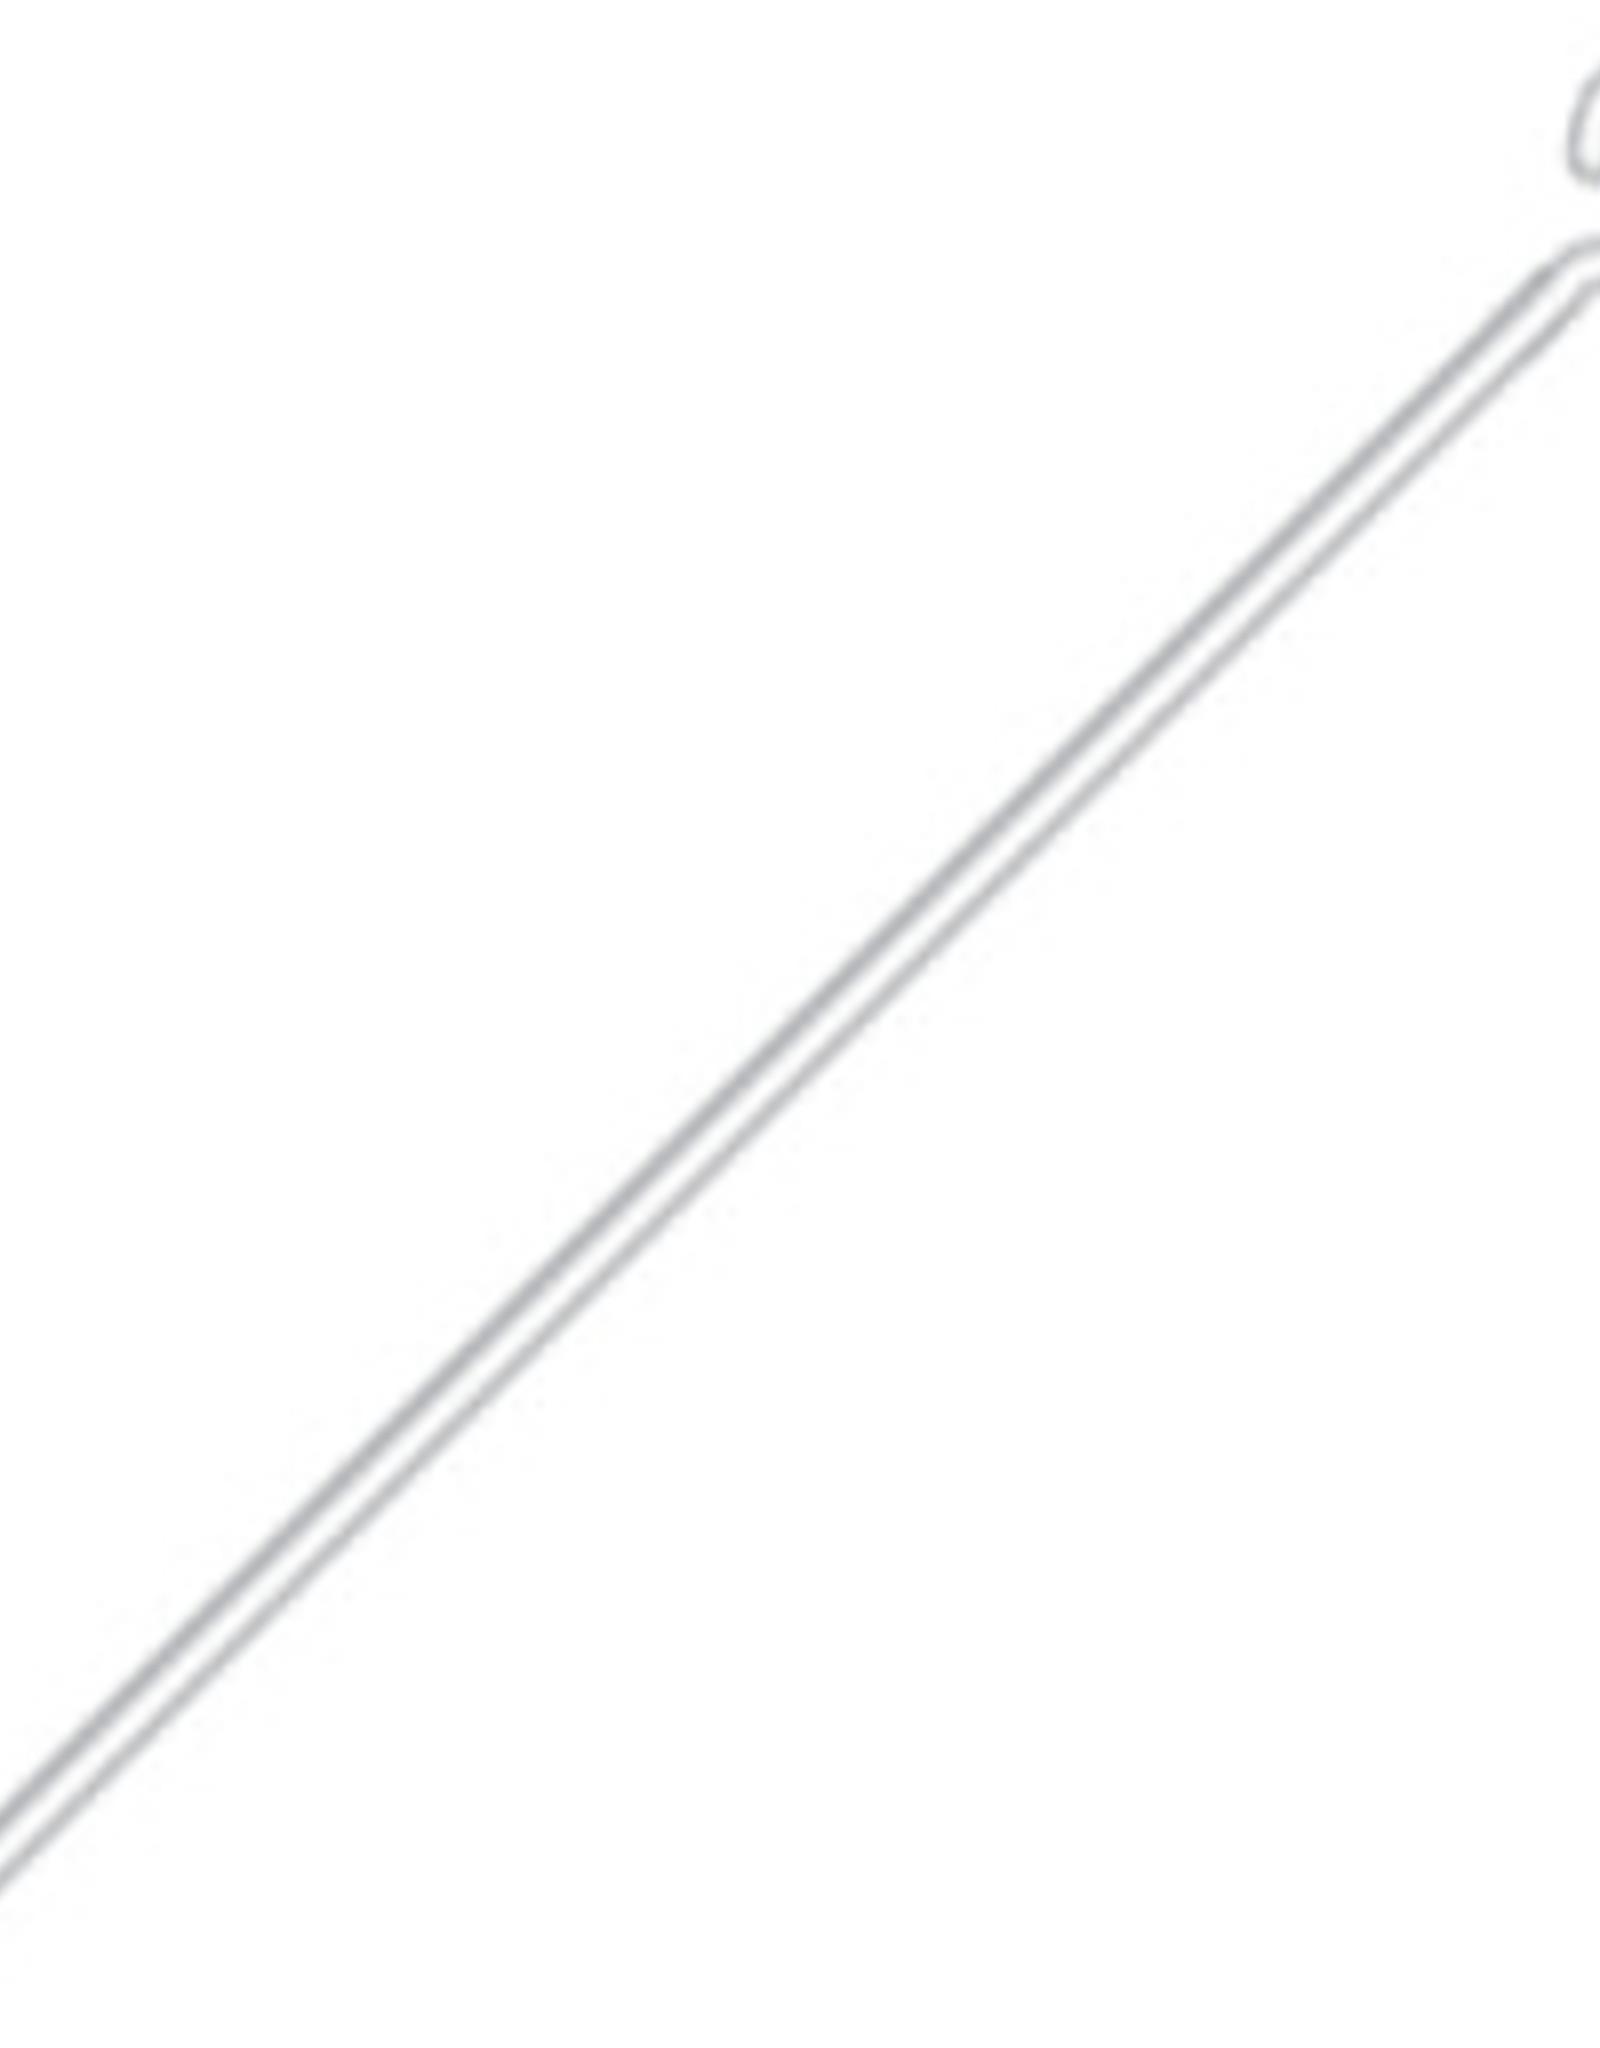 Eye Pins (100 pieces) Rhodium 1 Inches 24ga(.020)